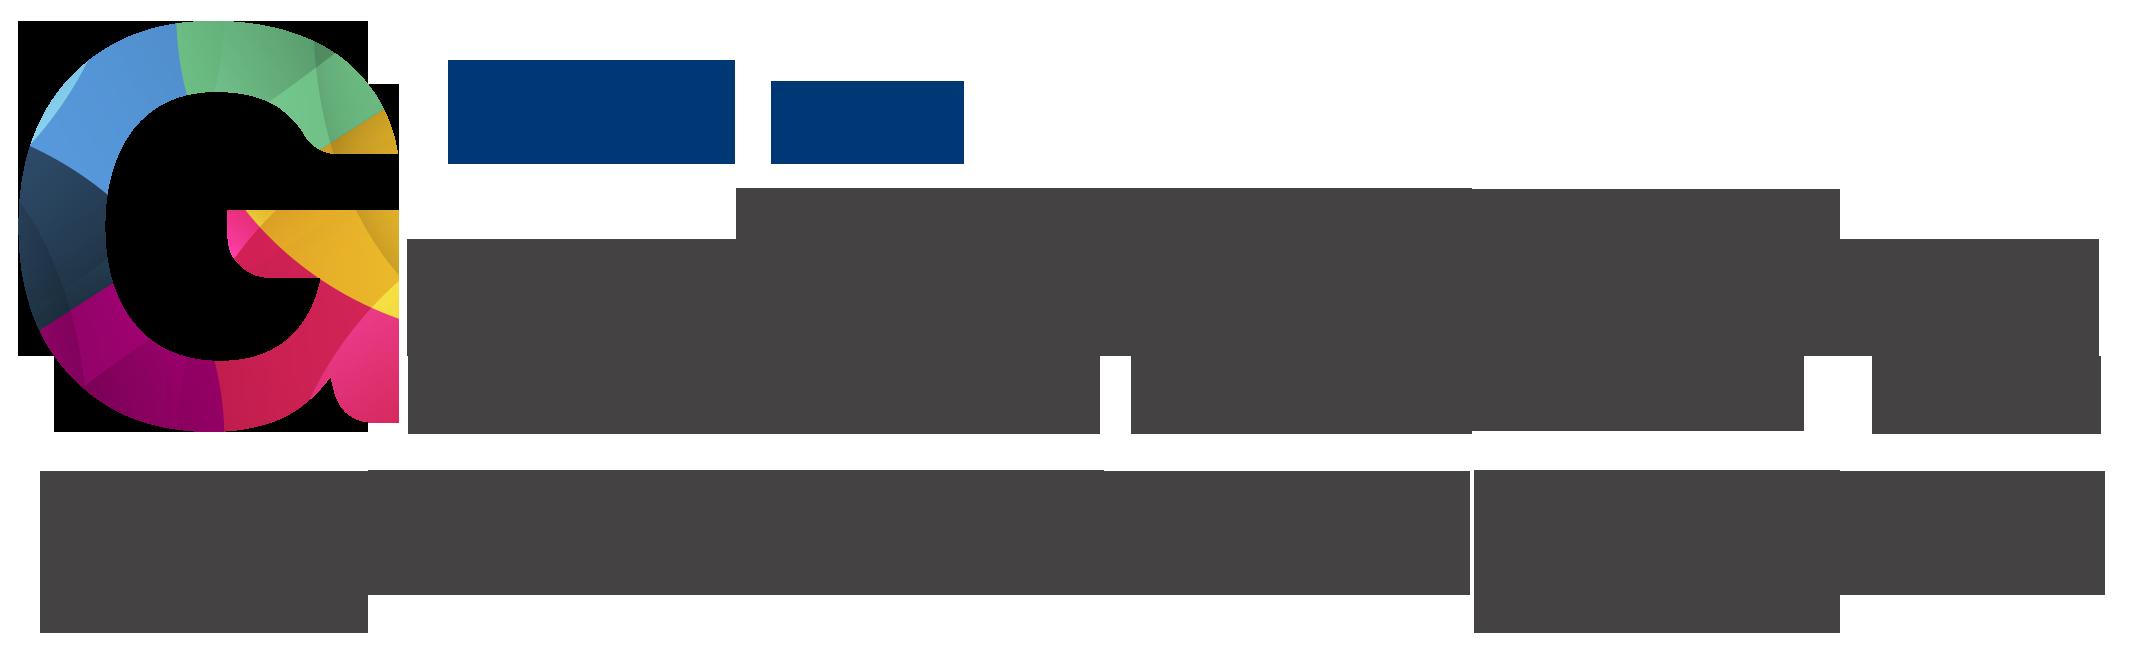 logo_gentemartins